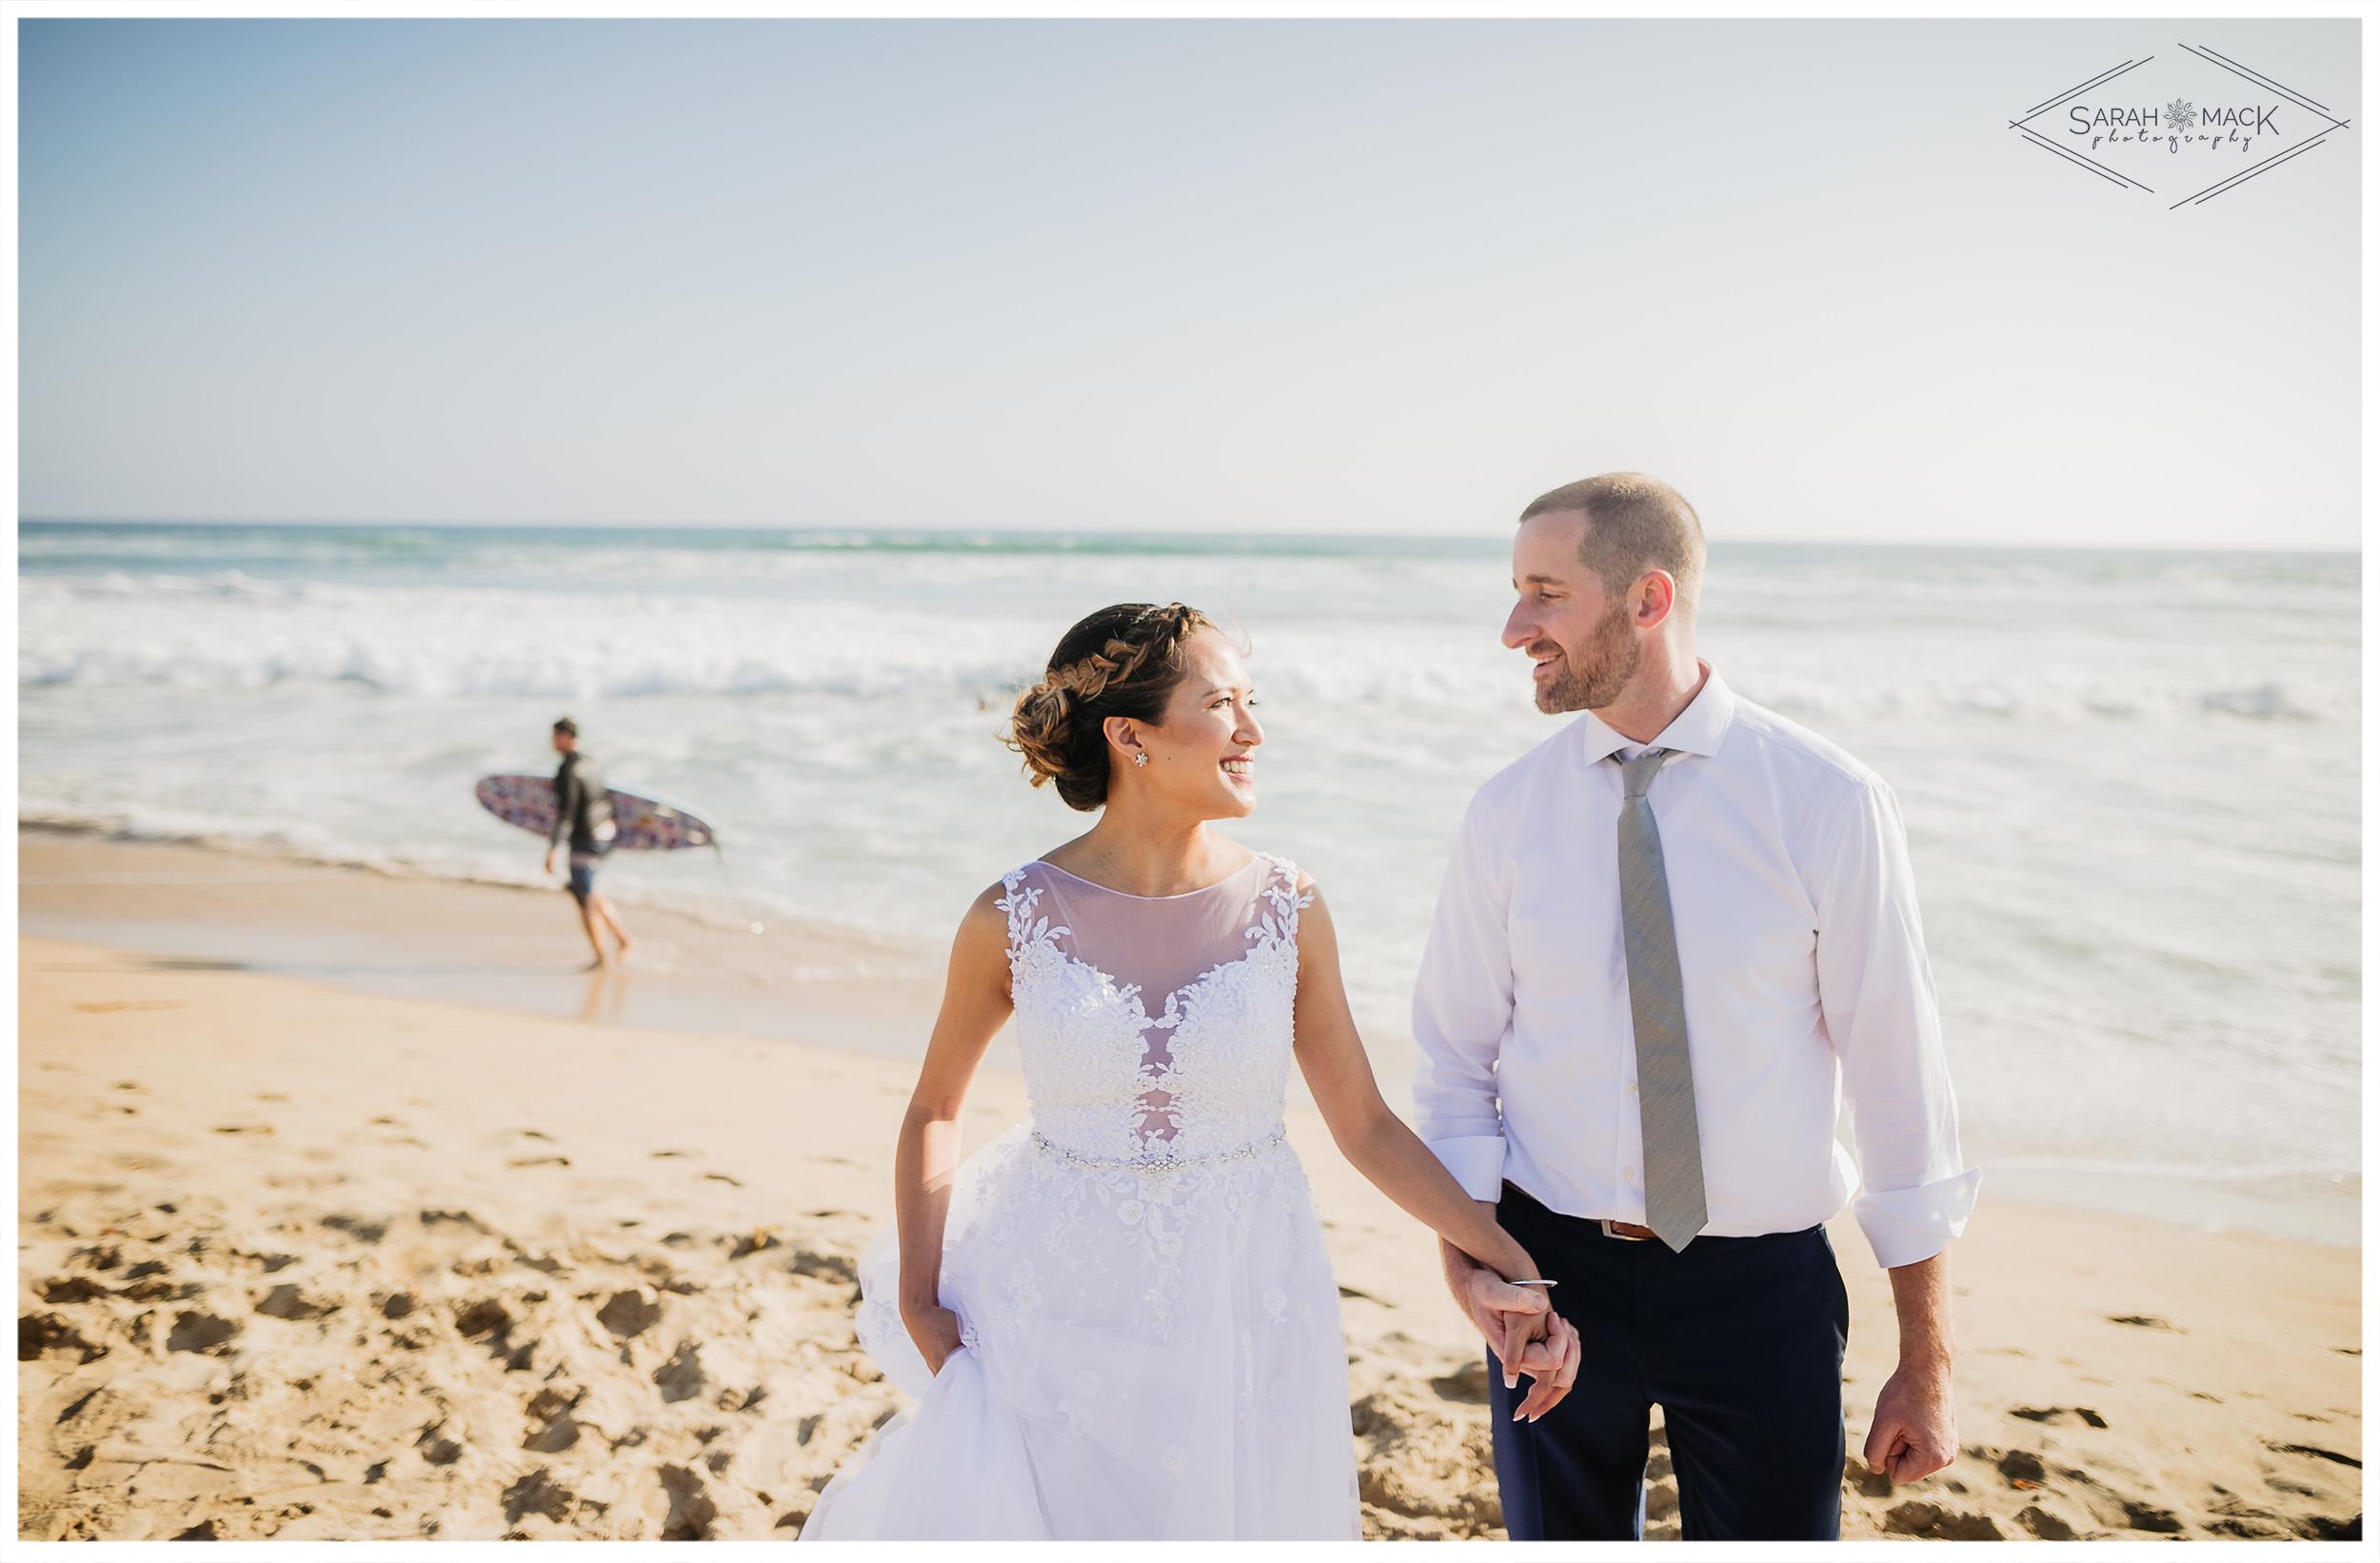 MR-Sea-Cliff-Country-Club-Wedding-Photography-48.jpg